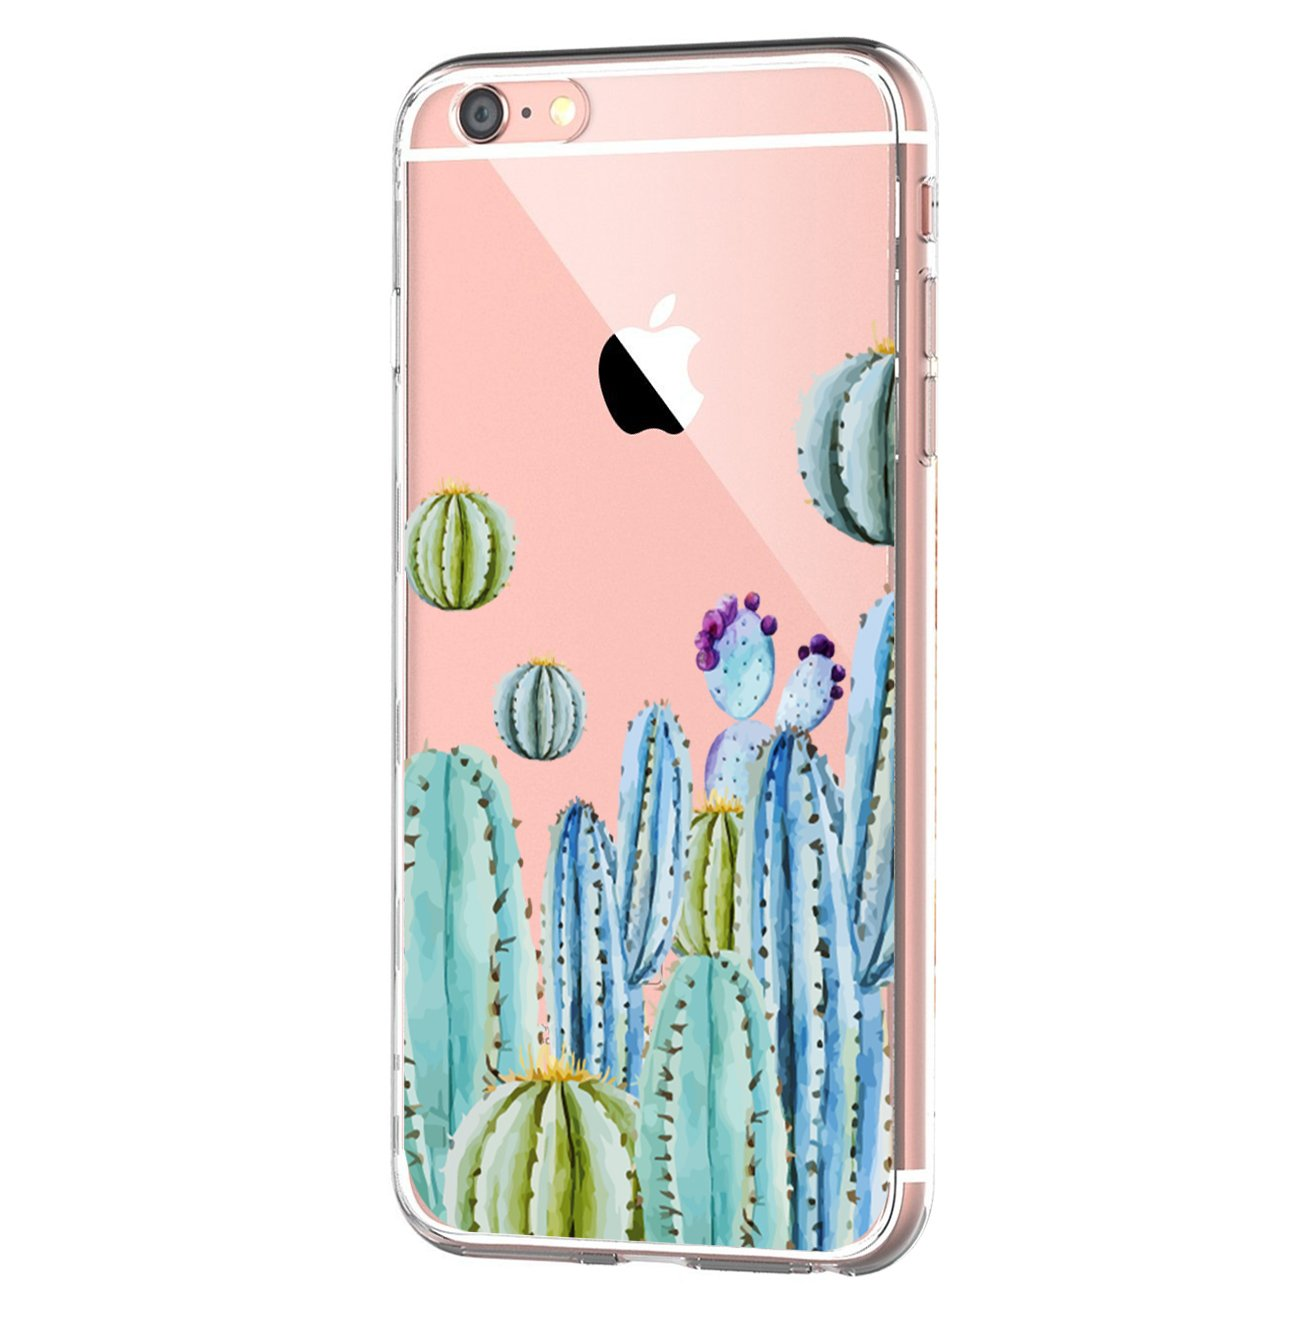 vanki iPhone 6 iPhone 6s hülle Tasten Fonts Schutzhülle Clear Case Cover Bumper Anti-Scratch TPU Silikon Durchsichtig Handyhülle für iPhone 6 Plus/6s Plus